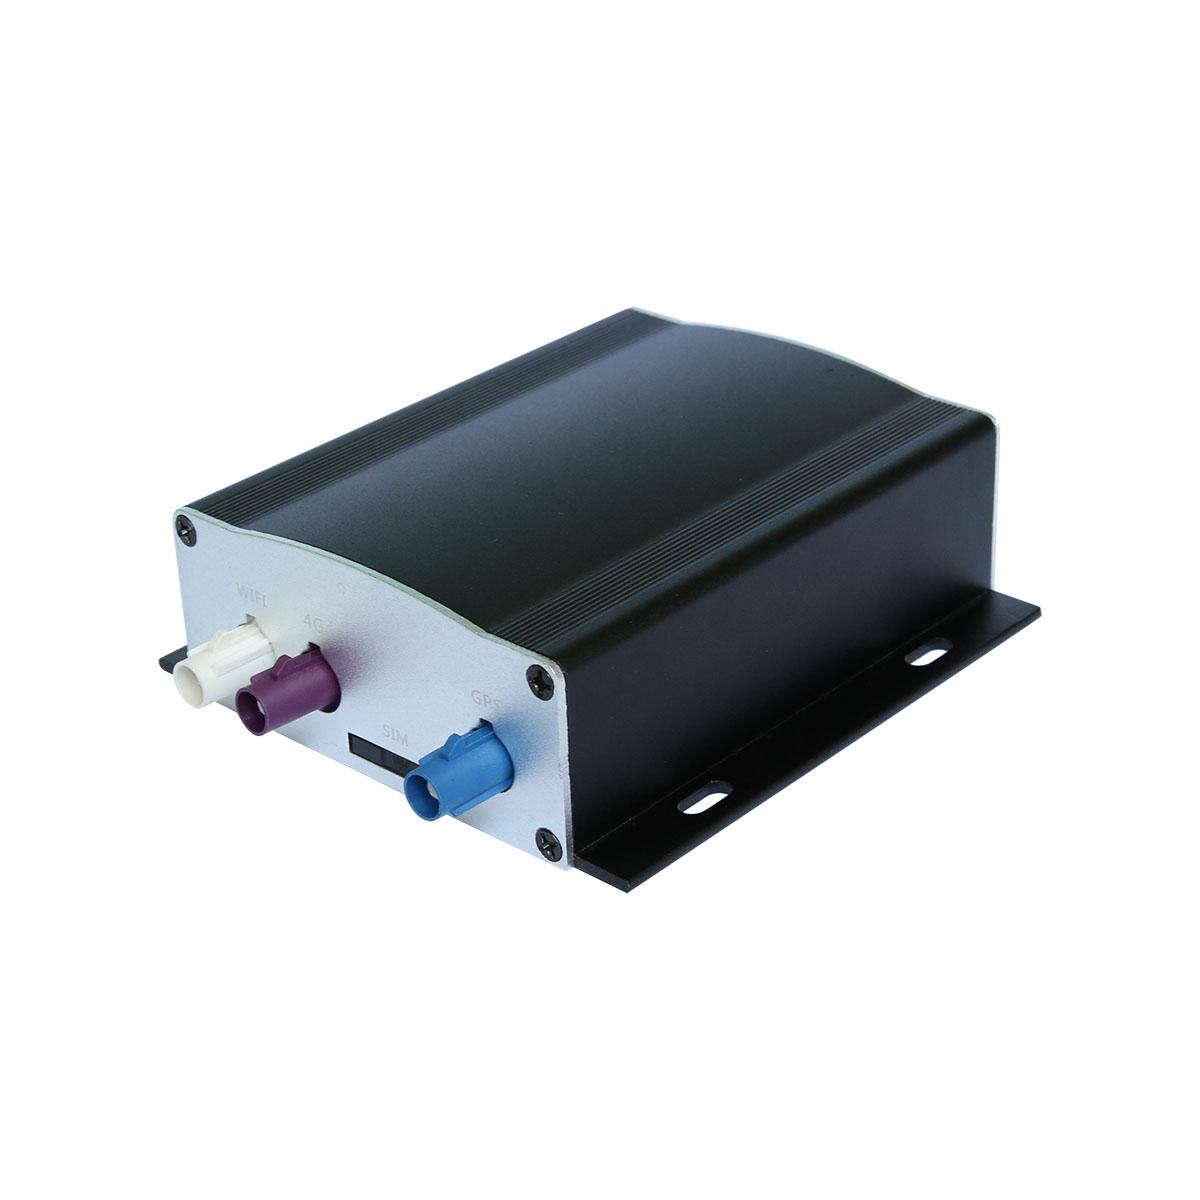 GB17691(远程OBD)远程检测汽车尾气排放管理车载终端